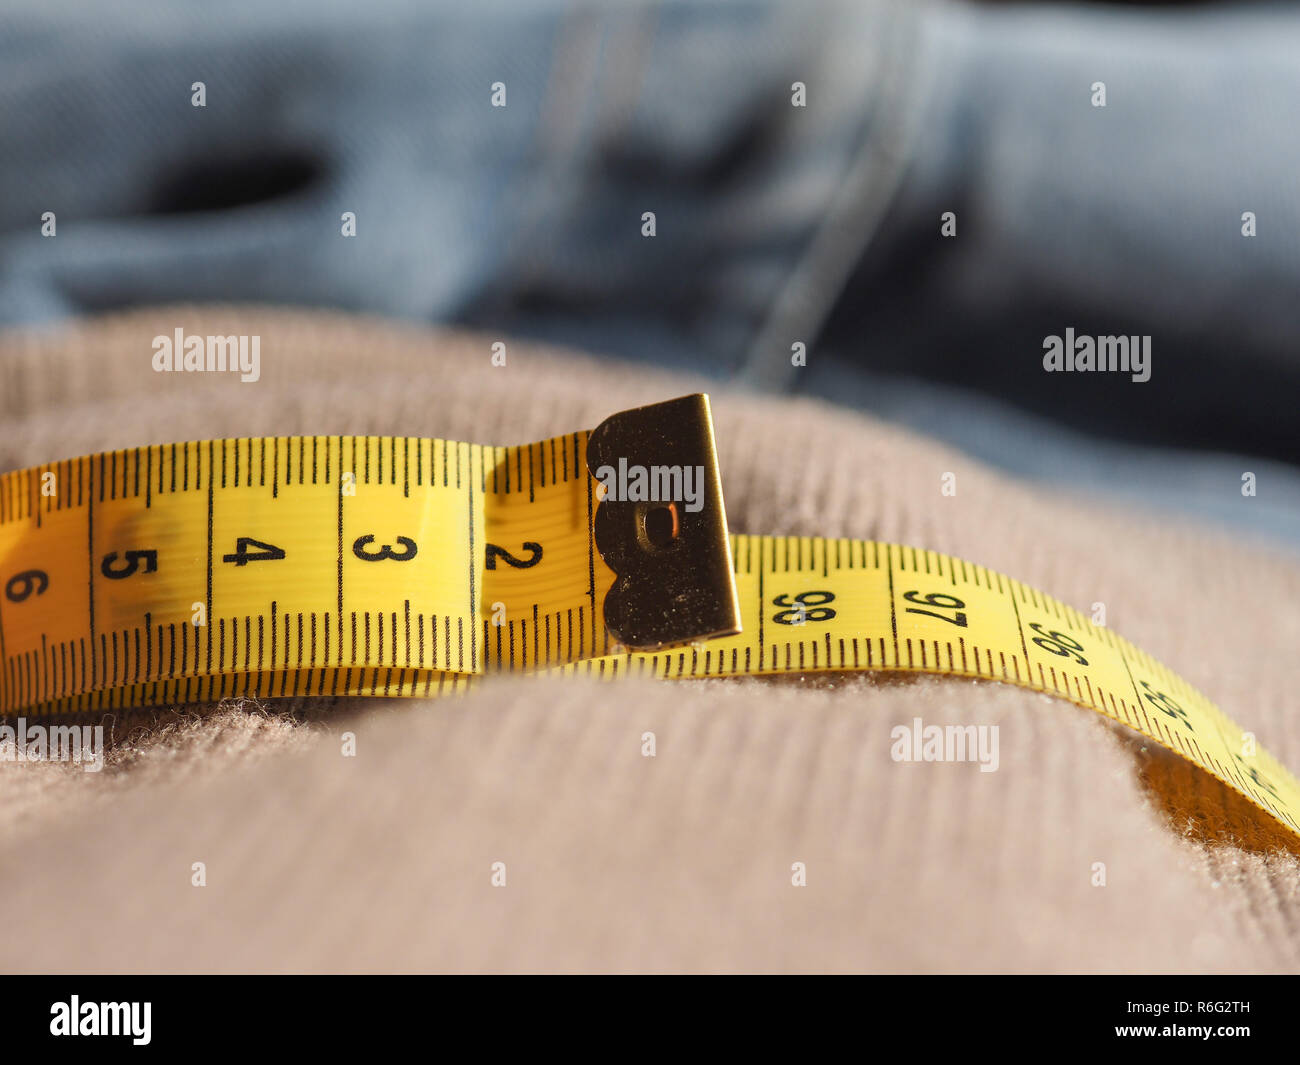 tailor meter ruler - Stock Image